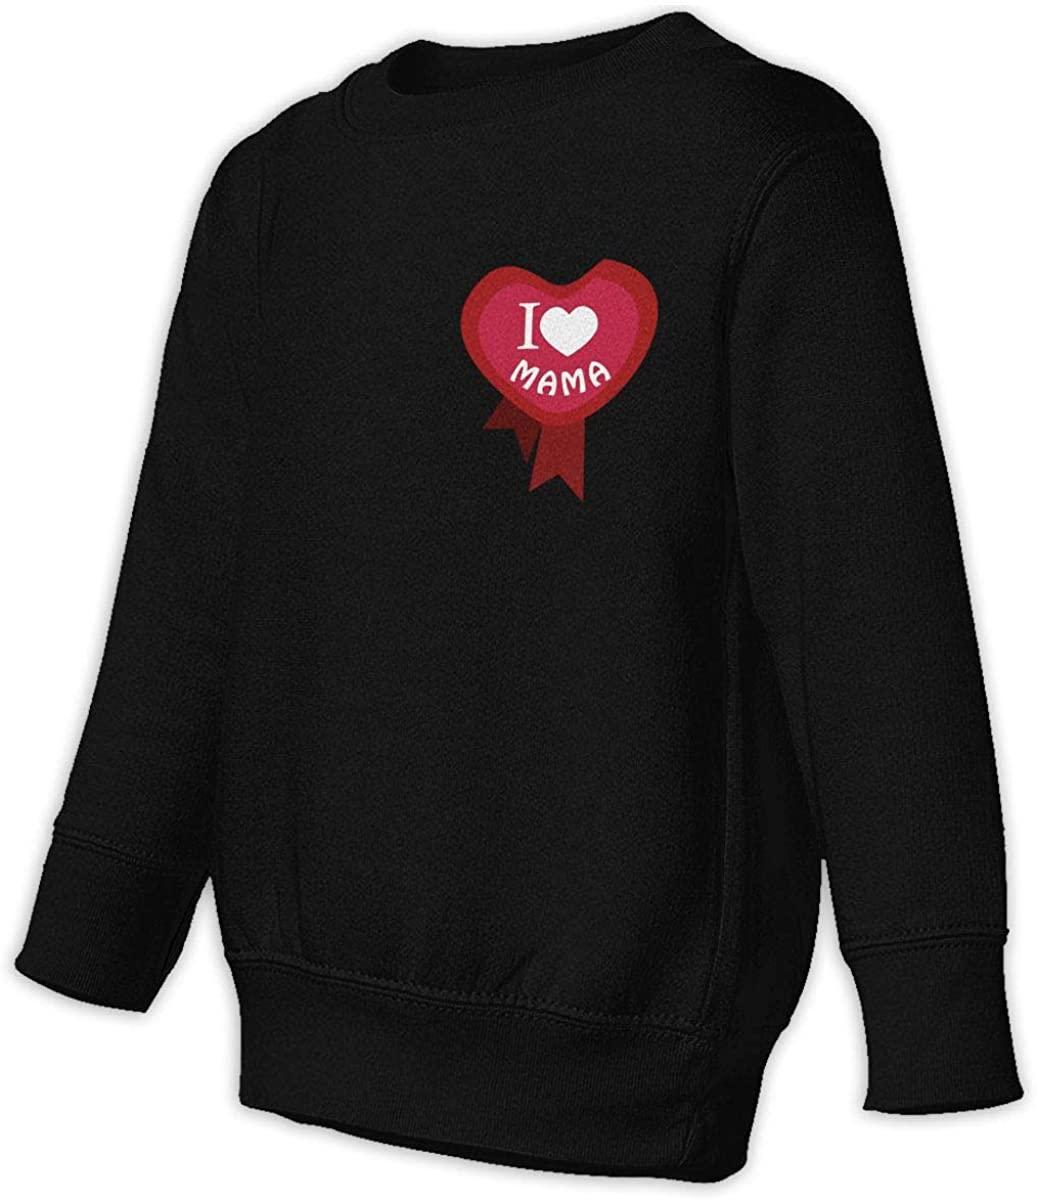 1836 I Love Mama Unisex Sweatshirt Youth Boy and Girls Pullover Sweatshirt